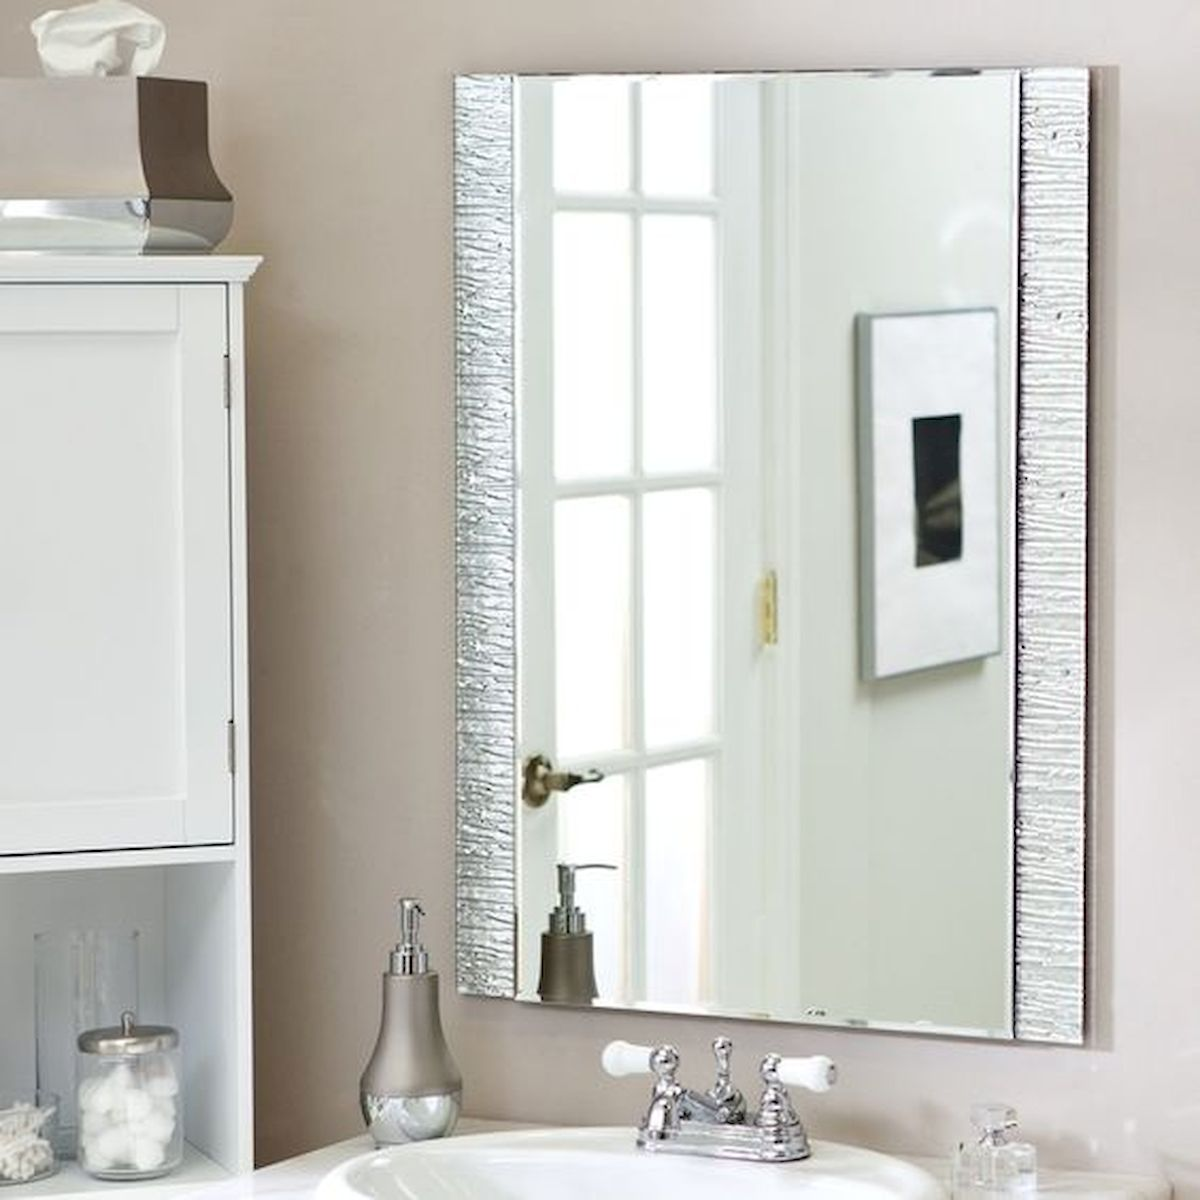 26 Easy and Creative DIY Mirror Ideas To Decorate Your Bathroom (25)